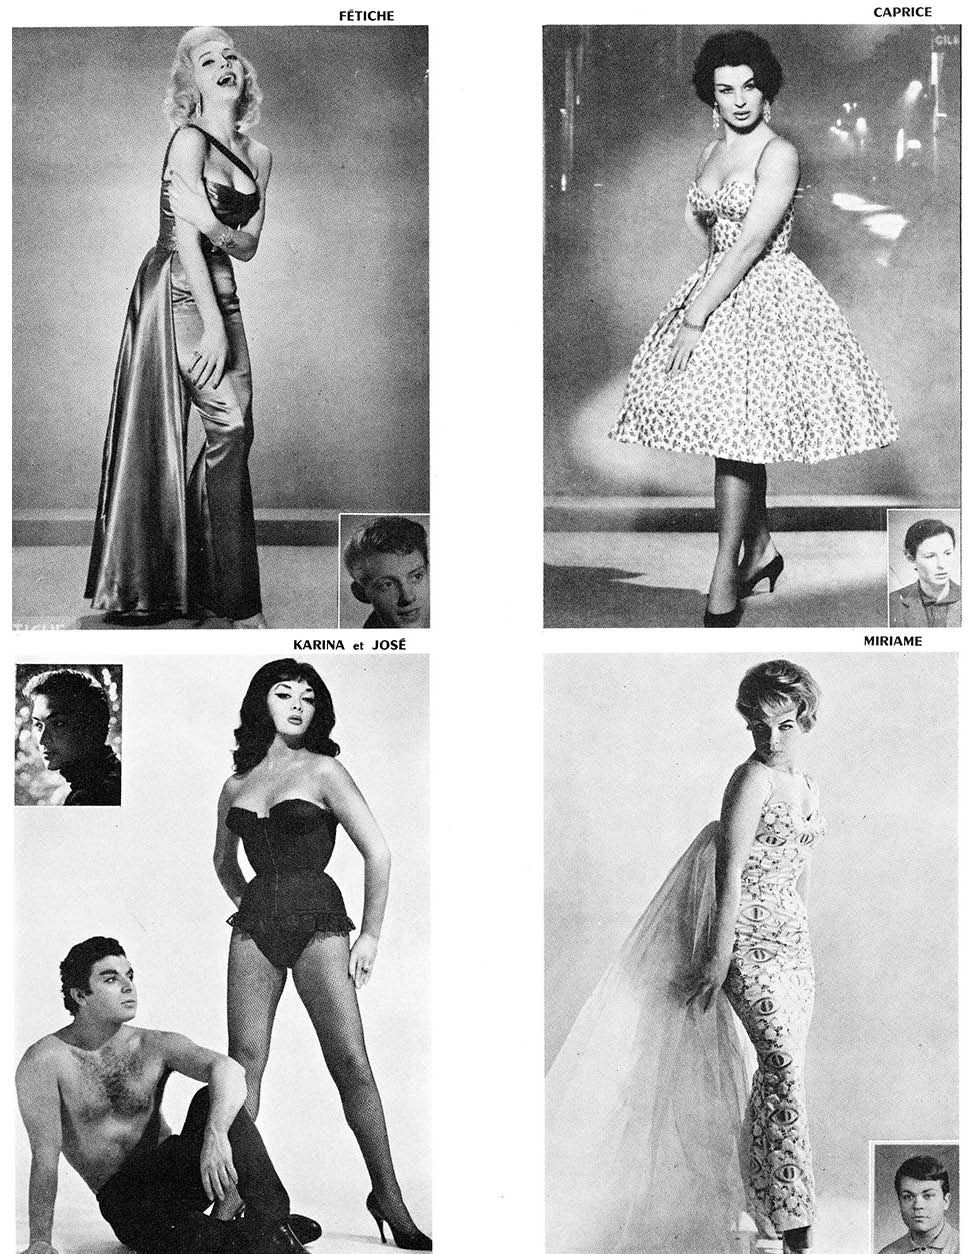 vintage transgender | Pin it 9 Like 1 Image